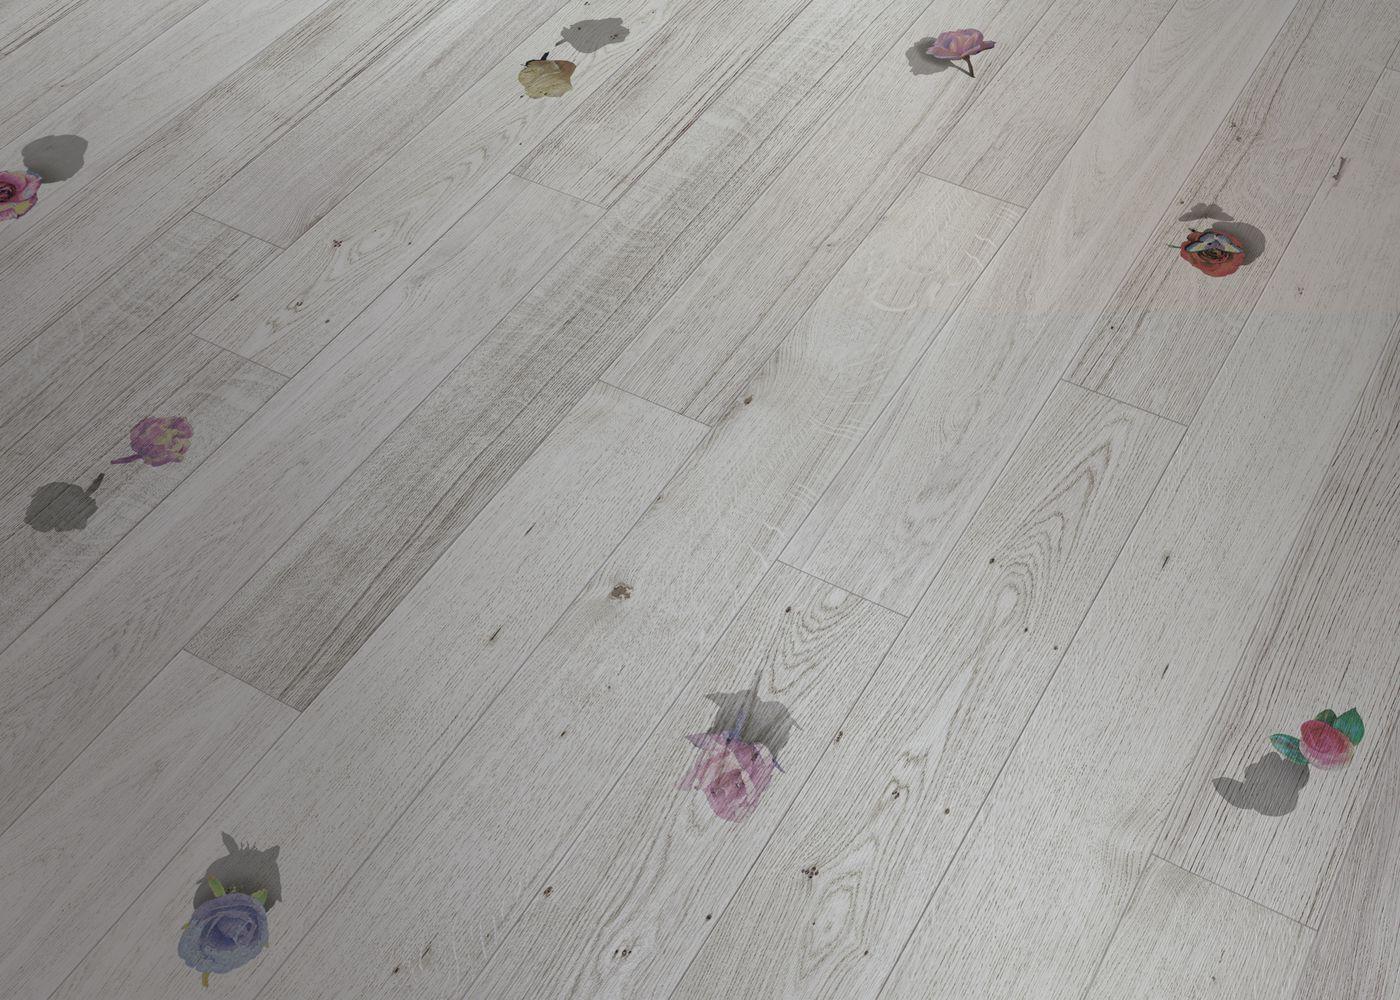 Rosae 2 - Parquet Contrecollé Chêne PR Bis Contemporain Vernis Brossé Mat Teinte Blanche - Design Rosae 2 (Cinzia Anguissola)